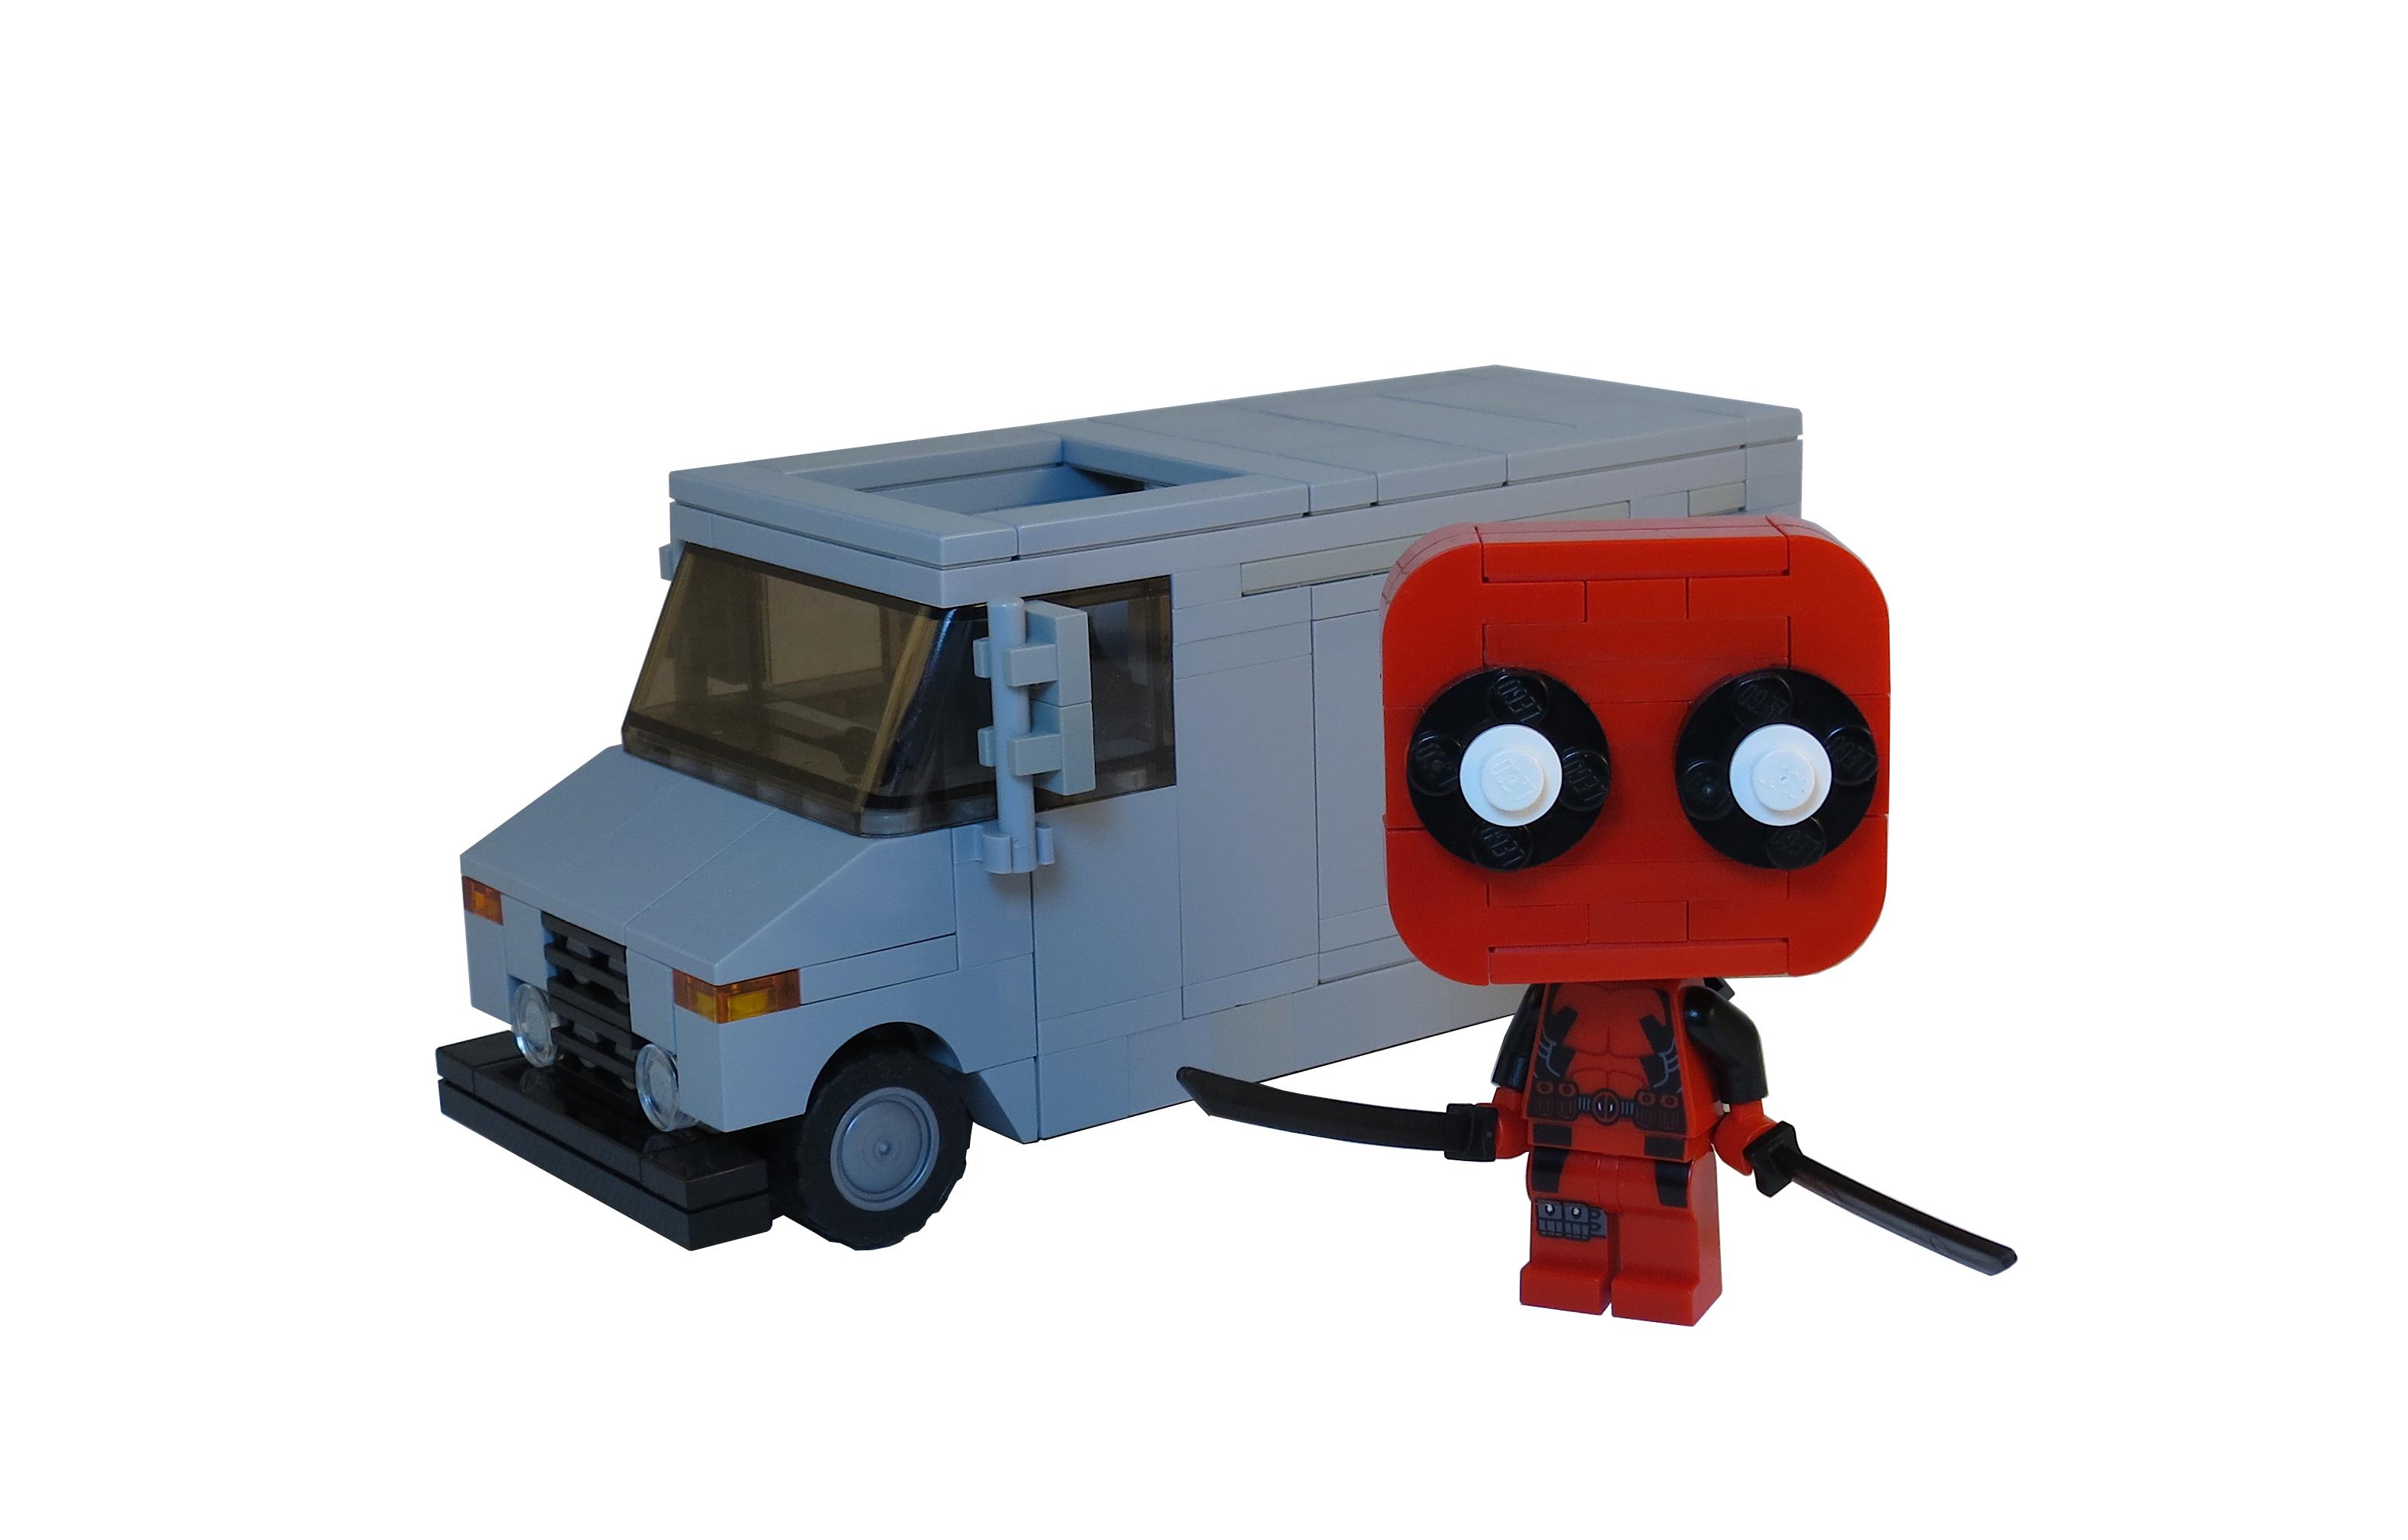 Wallpaper Truck Lego Marvel Funko Moc Deadpool Chimichangas 3158x2020 948866 Hd Wallpapers Wallhere